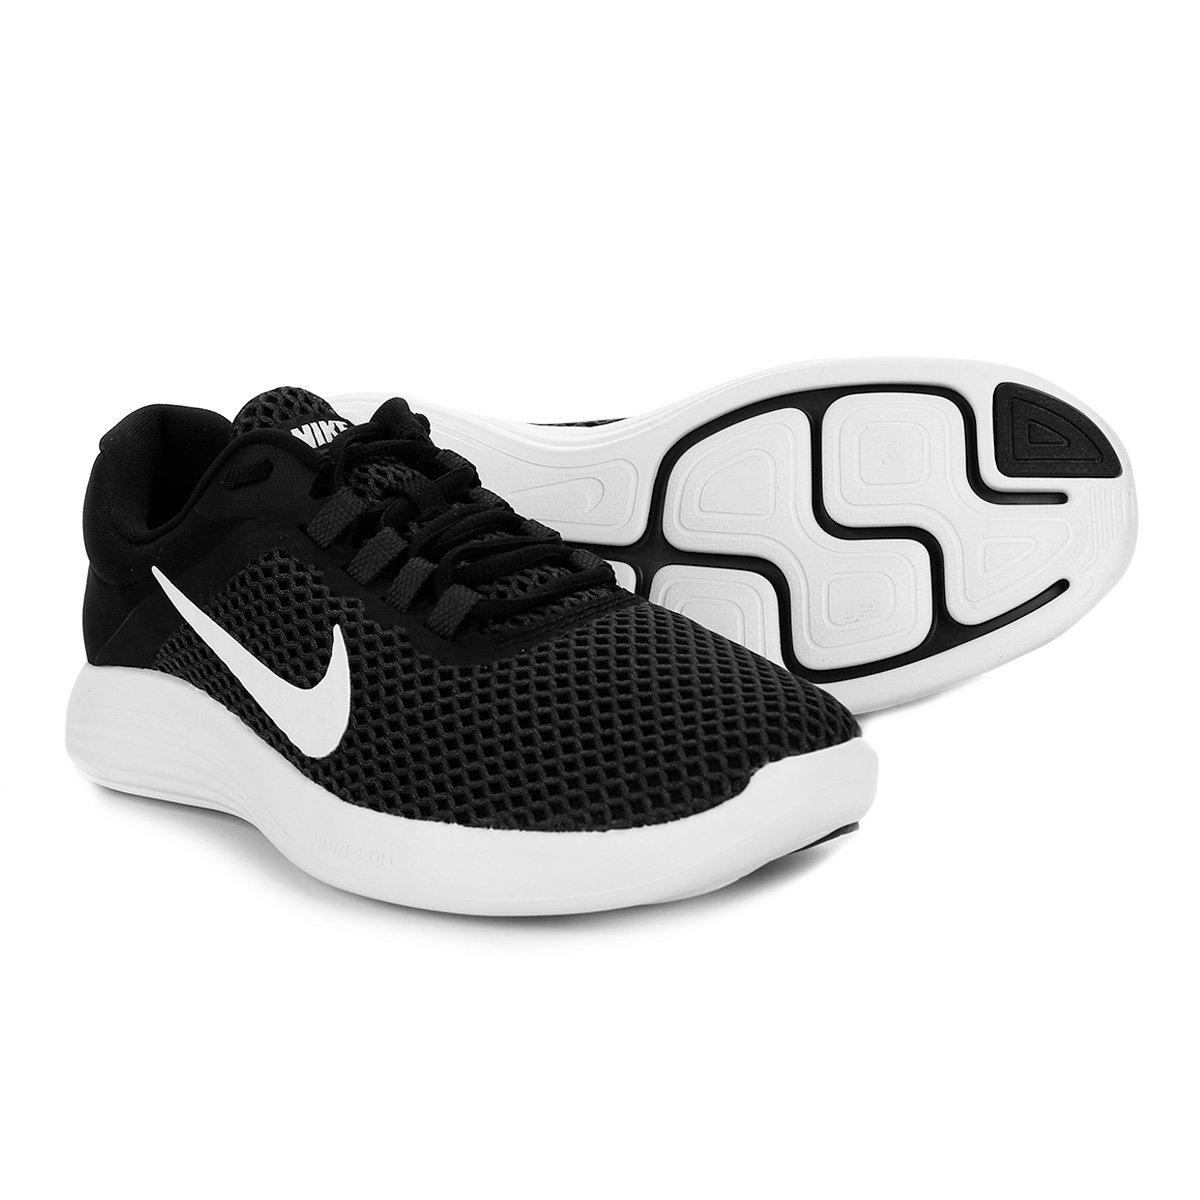 ee8d8858d0b Tênis Nike Lunarconverge 2 Masculino - Preto e Branco - Compre Agora ...